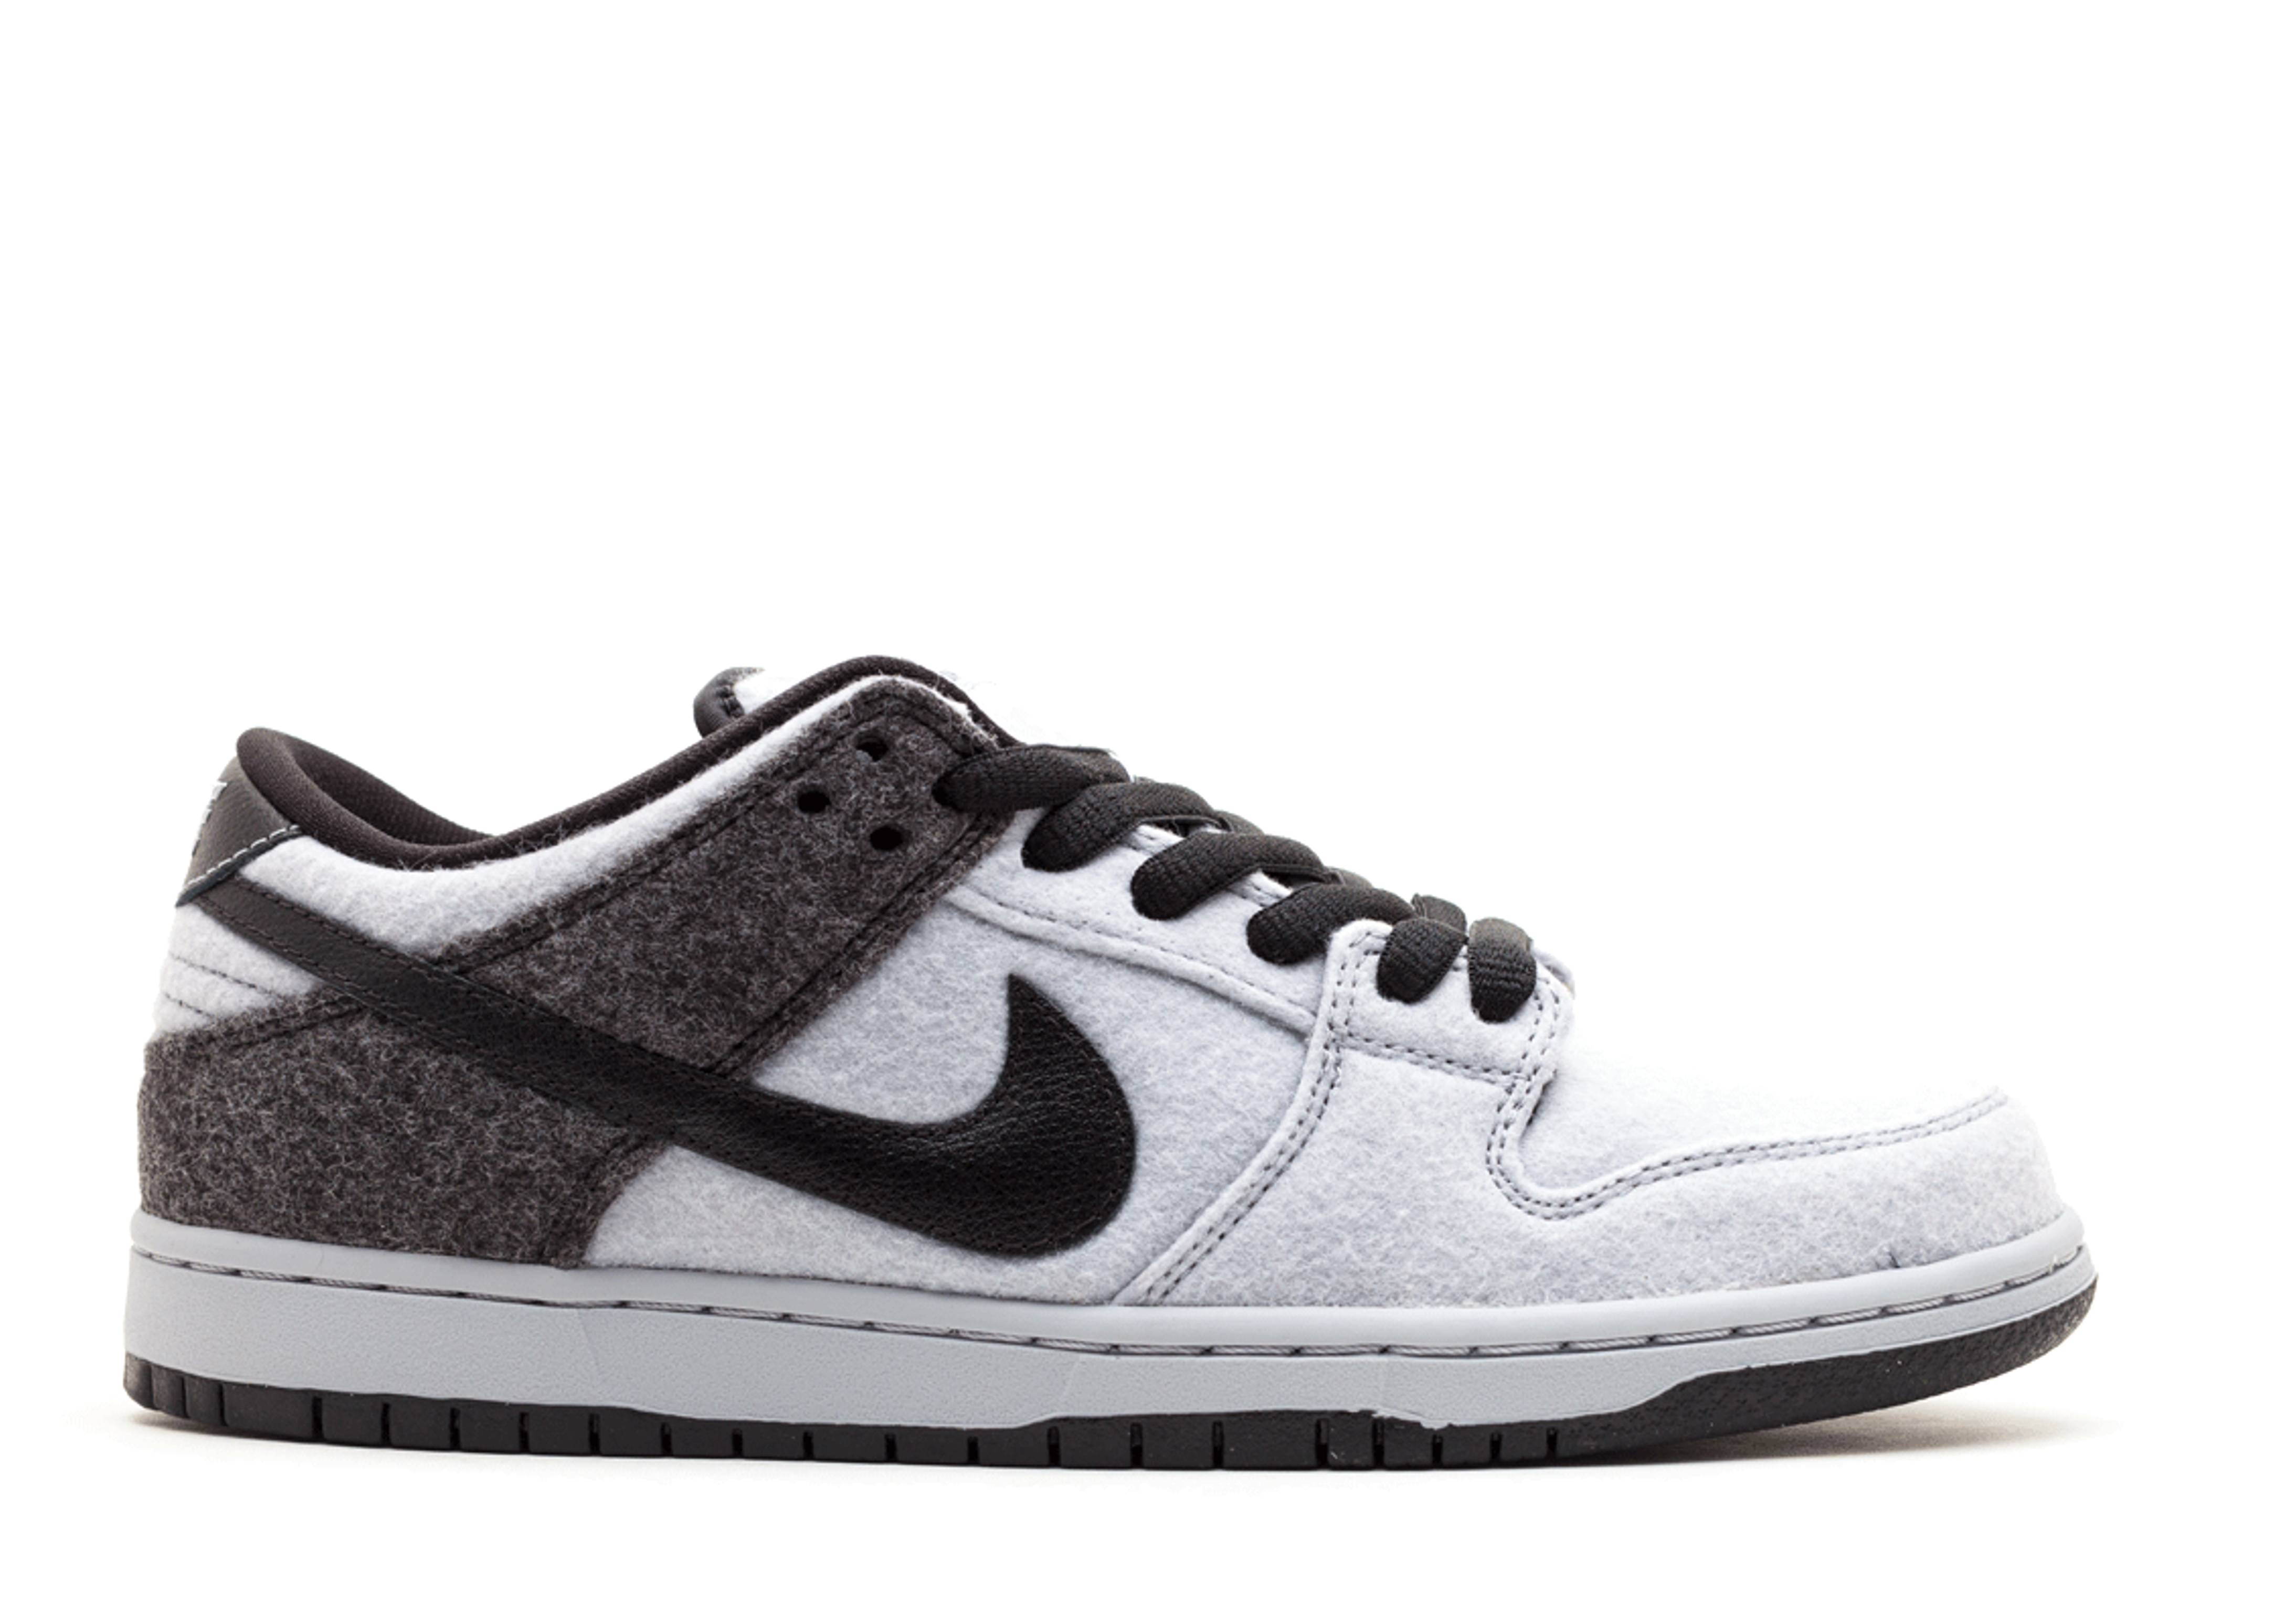 Men's Nike Dunk Low PRM SB Wolf Grey Black Sneakers : K58u472